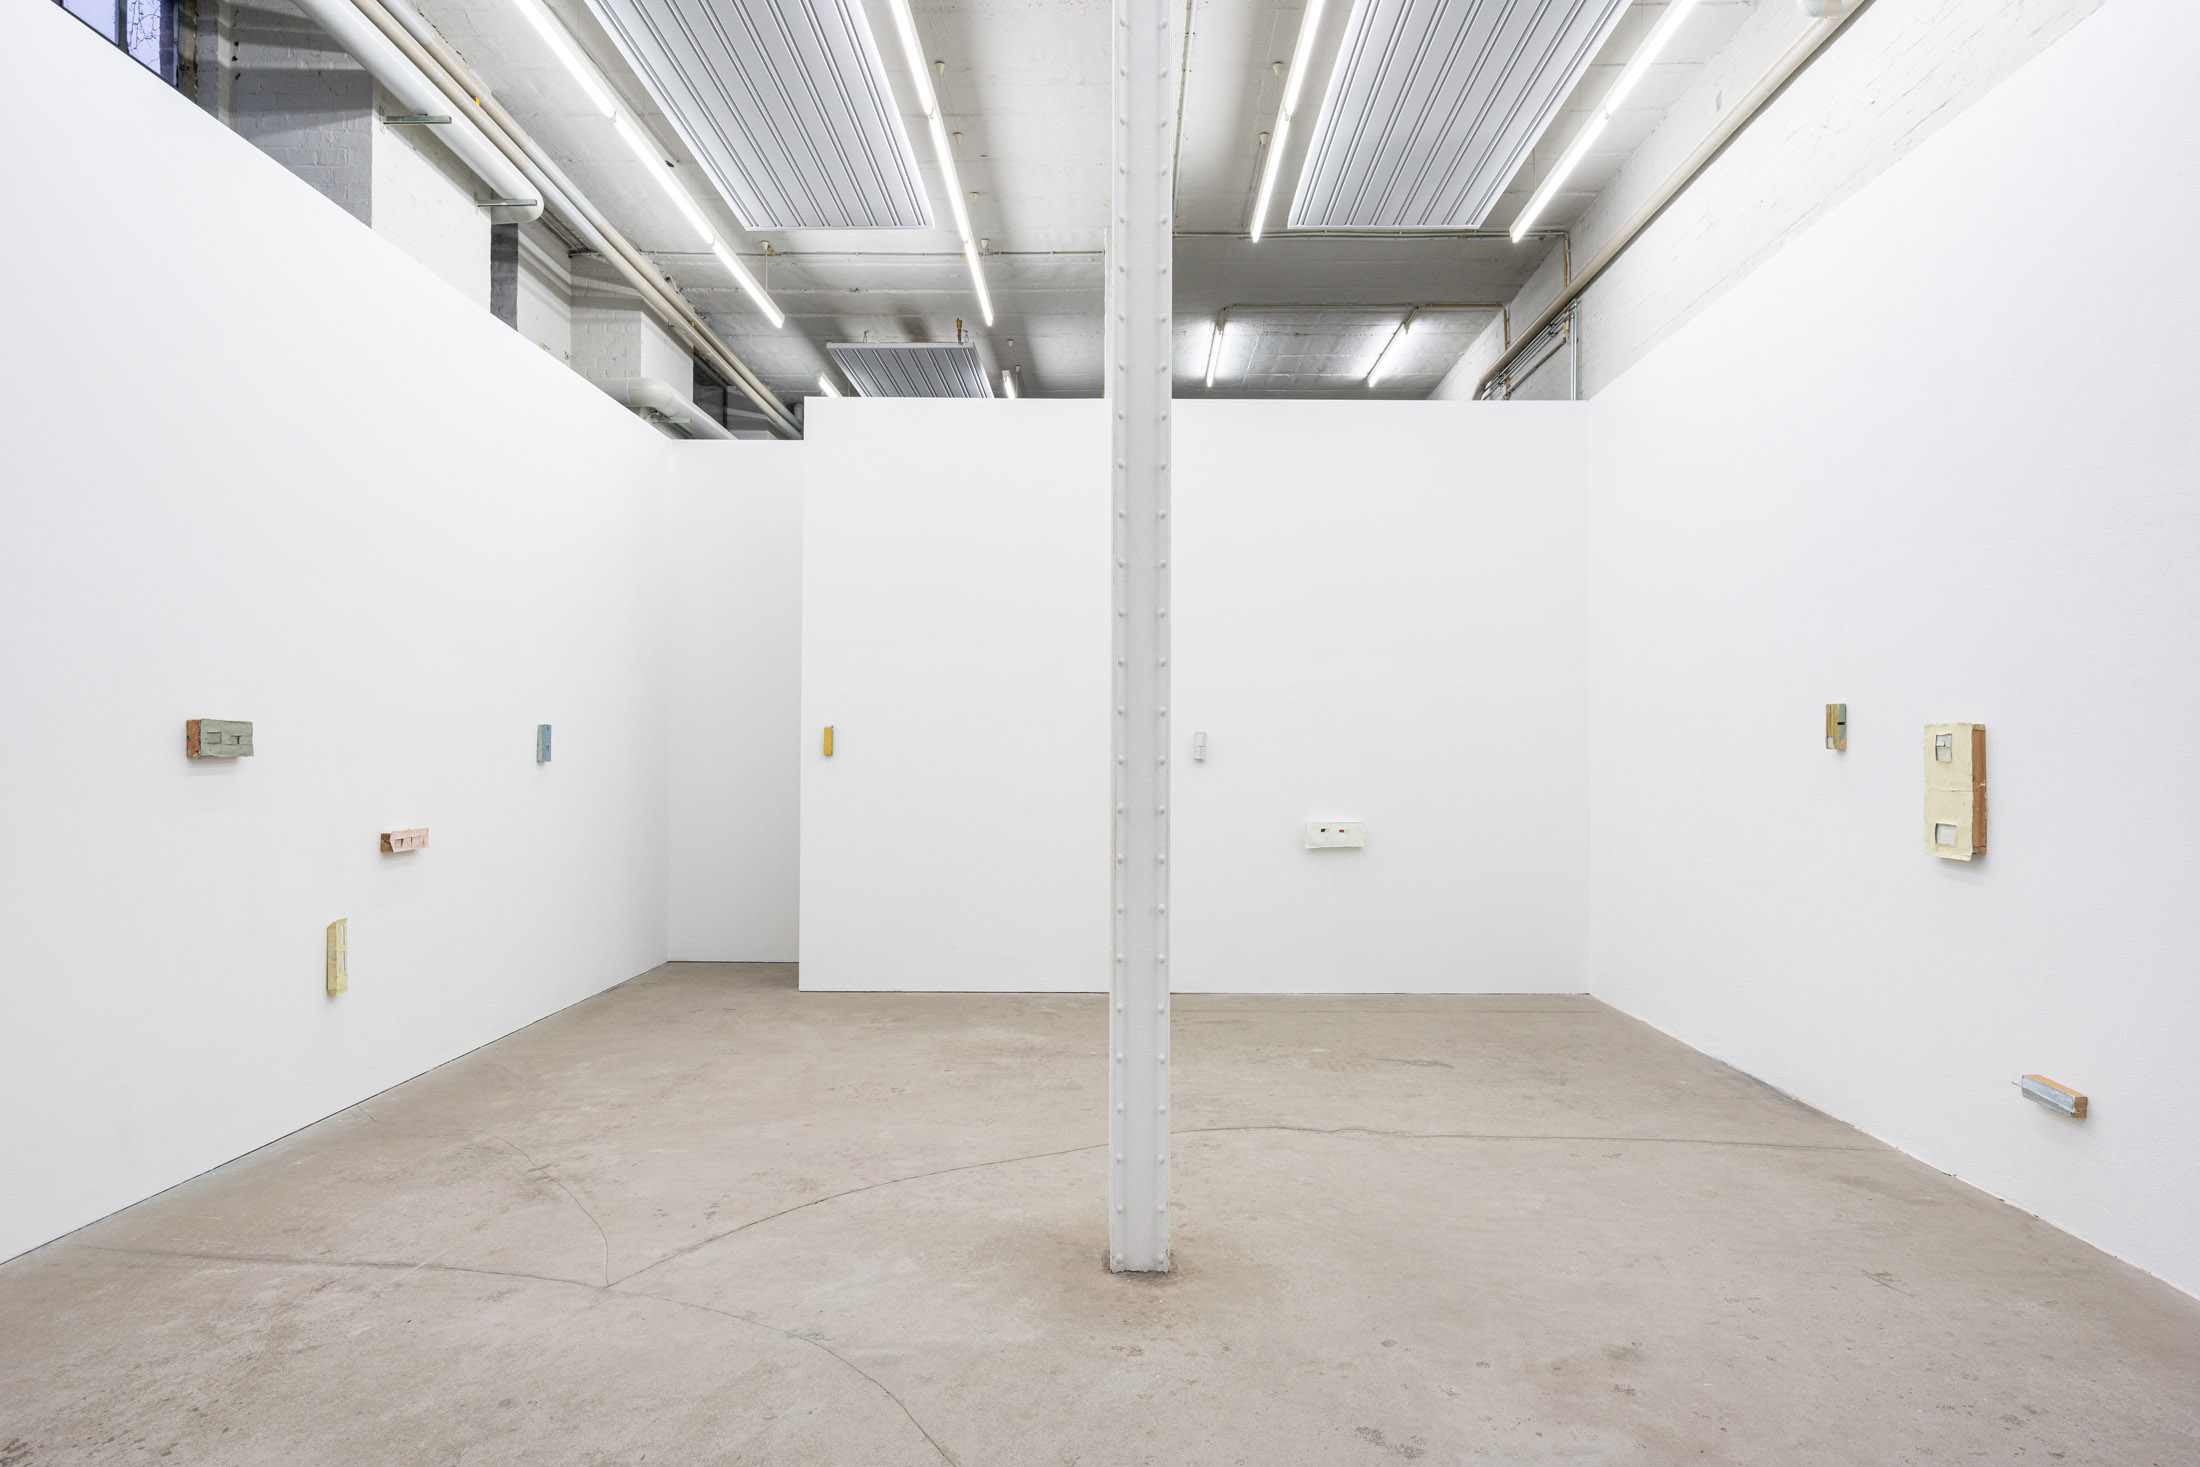 Max Huckle at Galerie Tobias Naehring, Leipzig